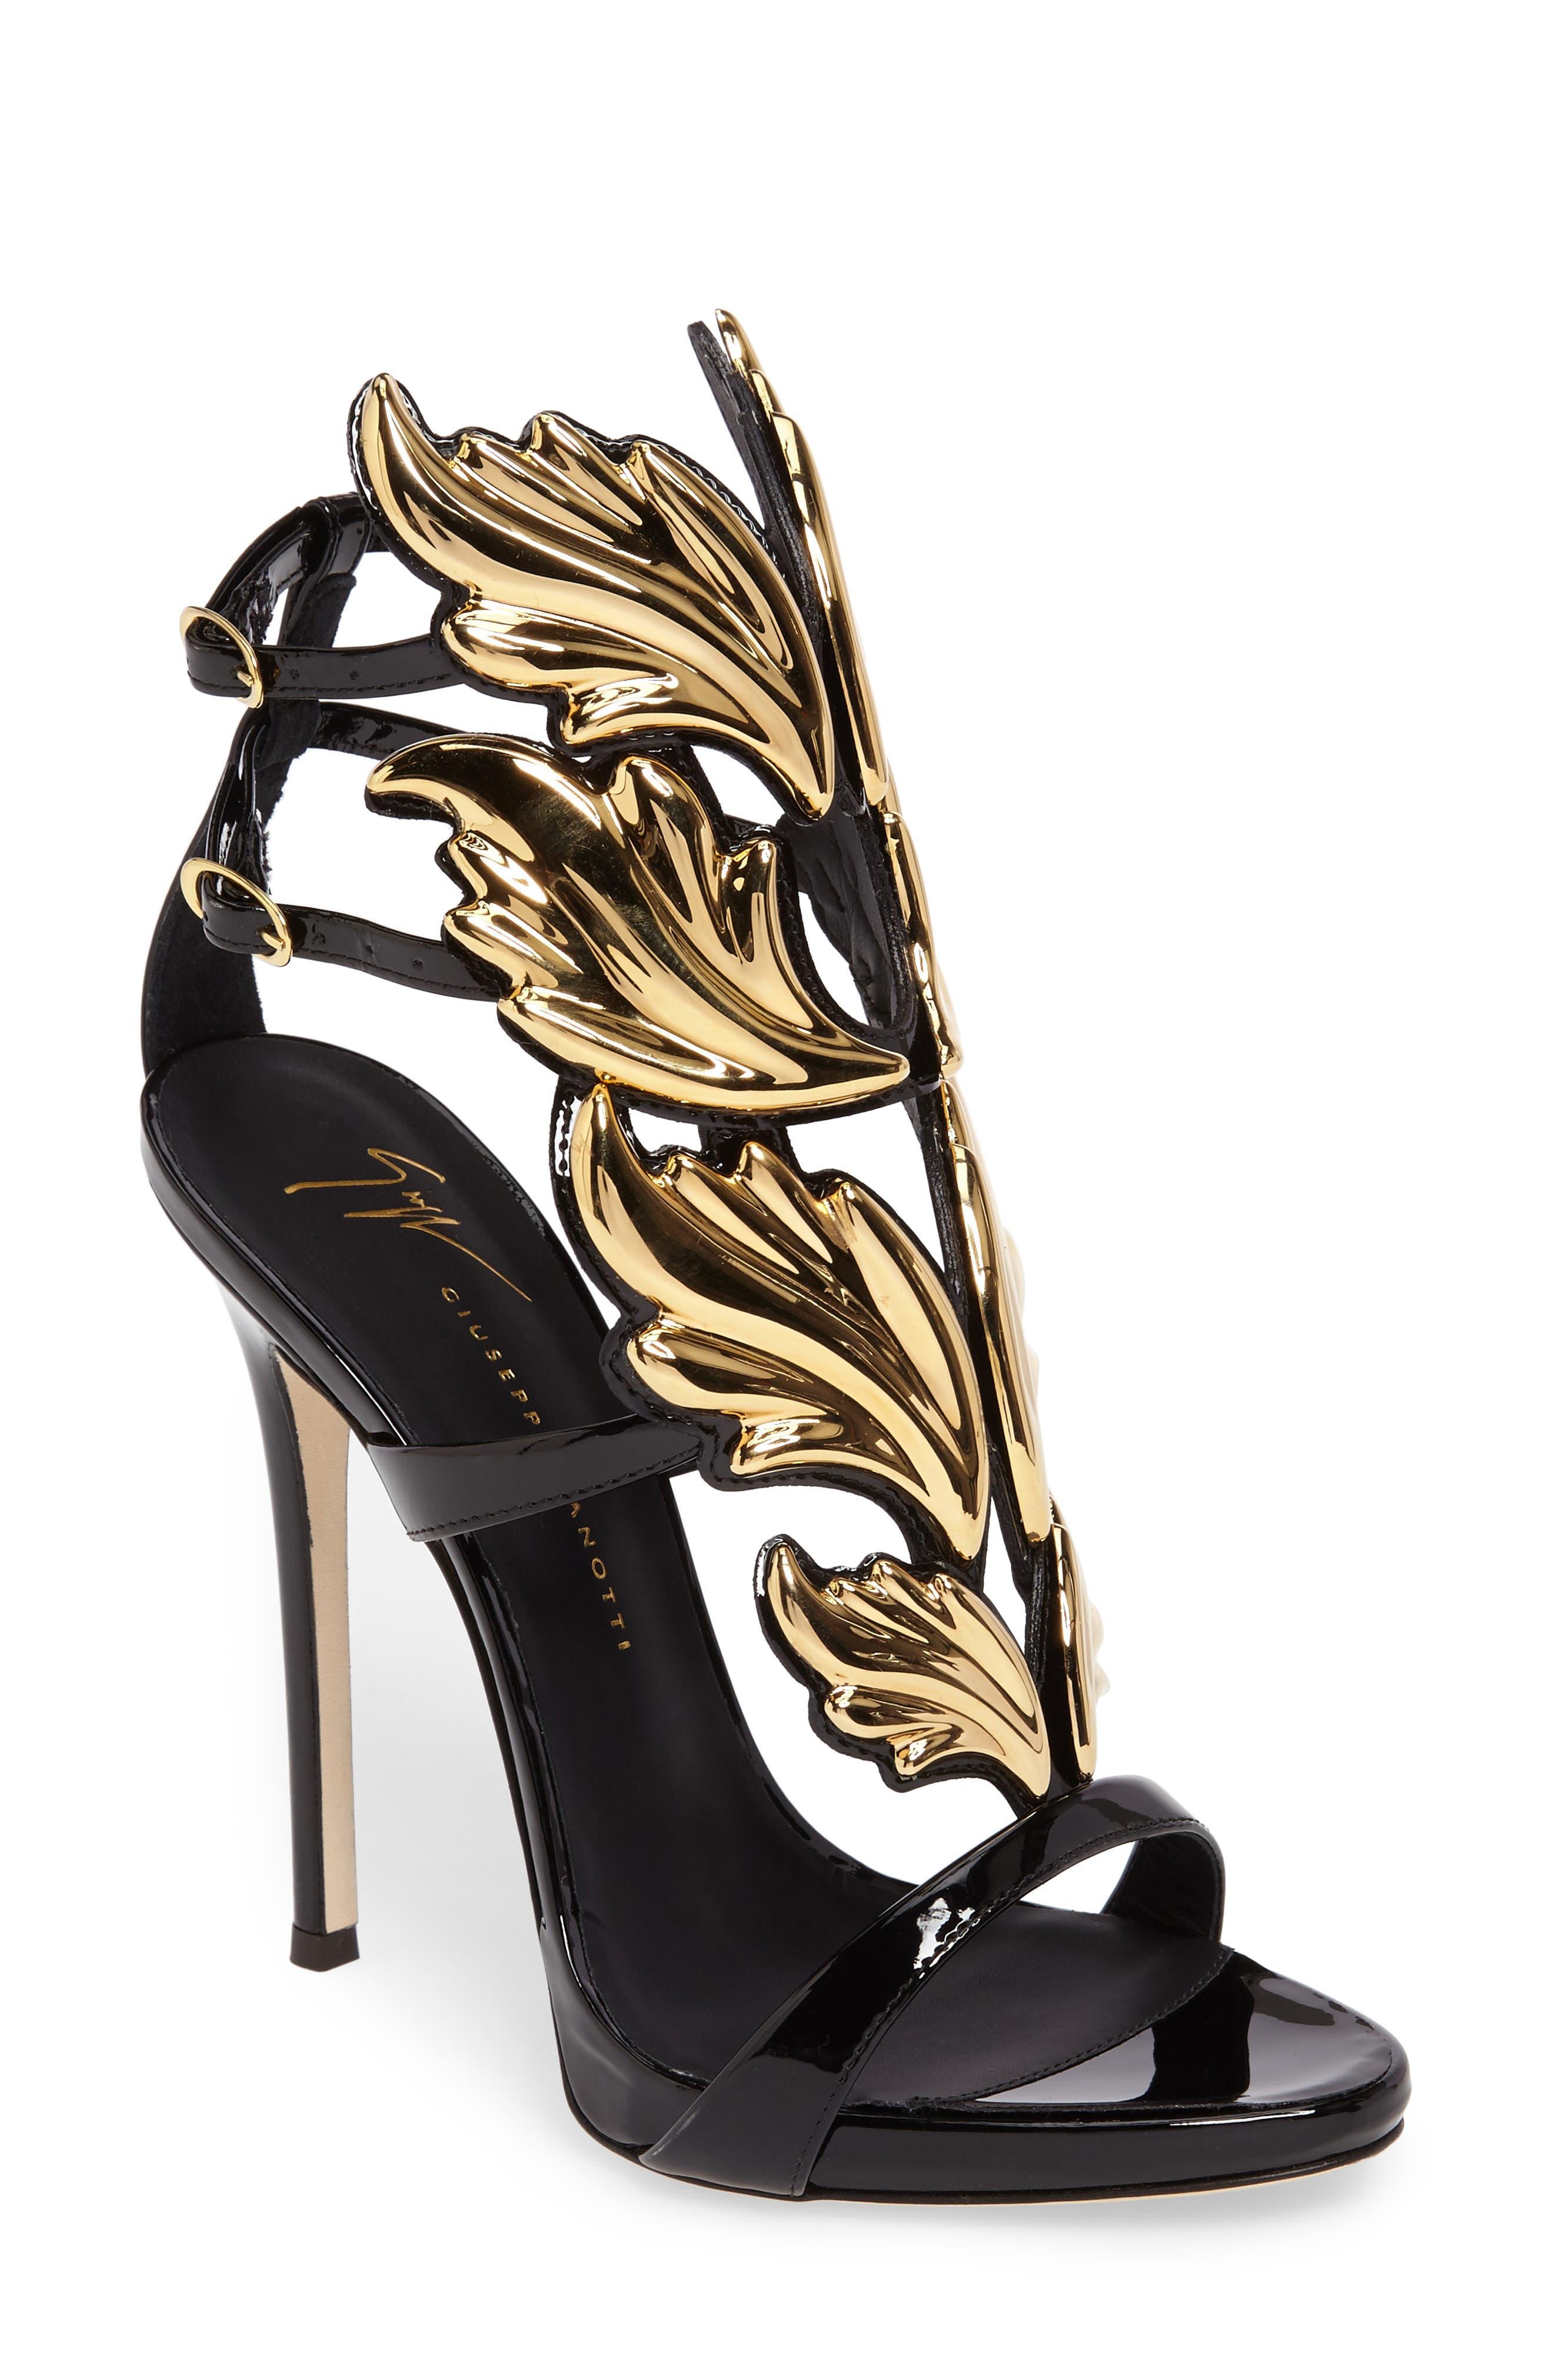 GIUSEPPE ZANOTTI Cruel Wing Sandal, Main, color, BLACK/ GOLD